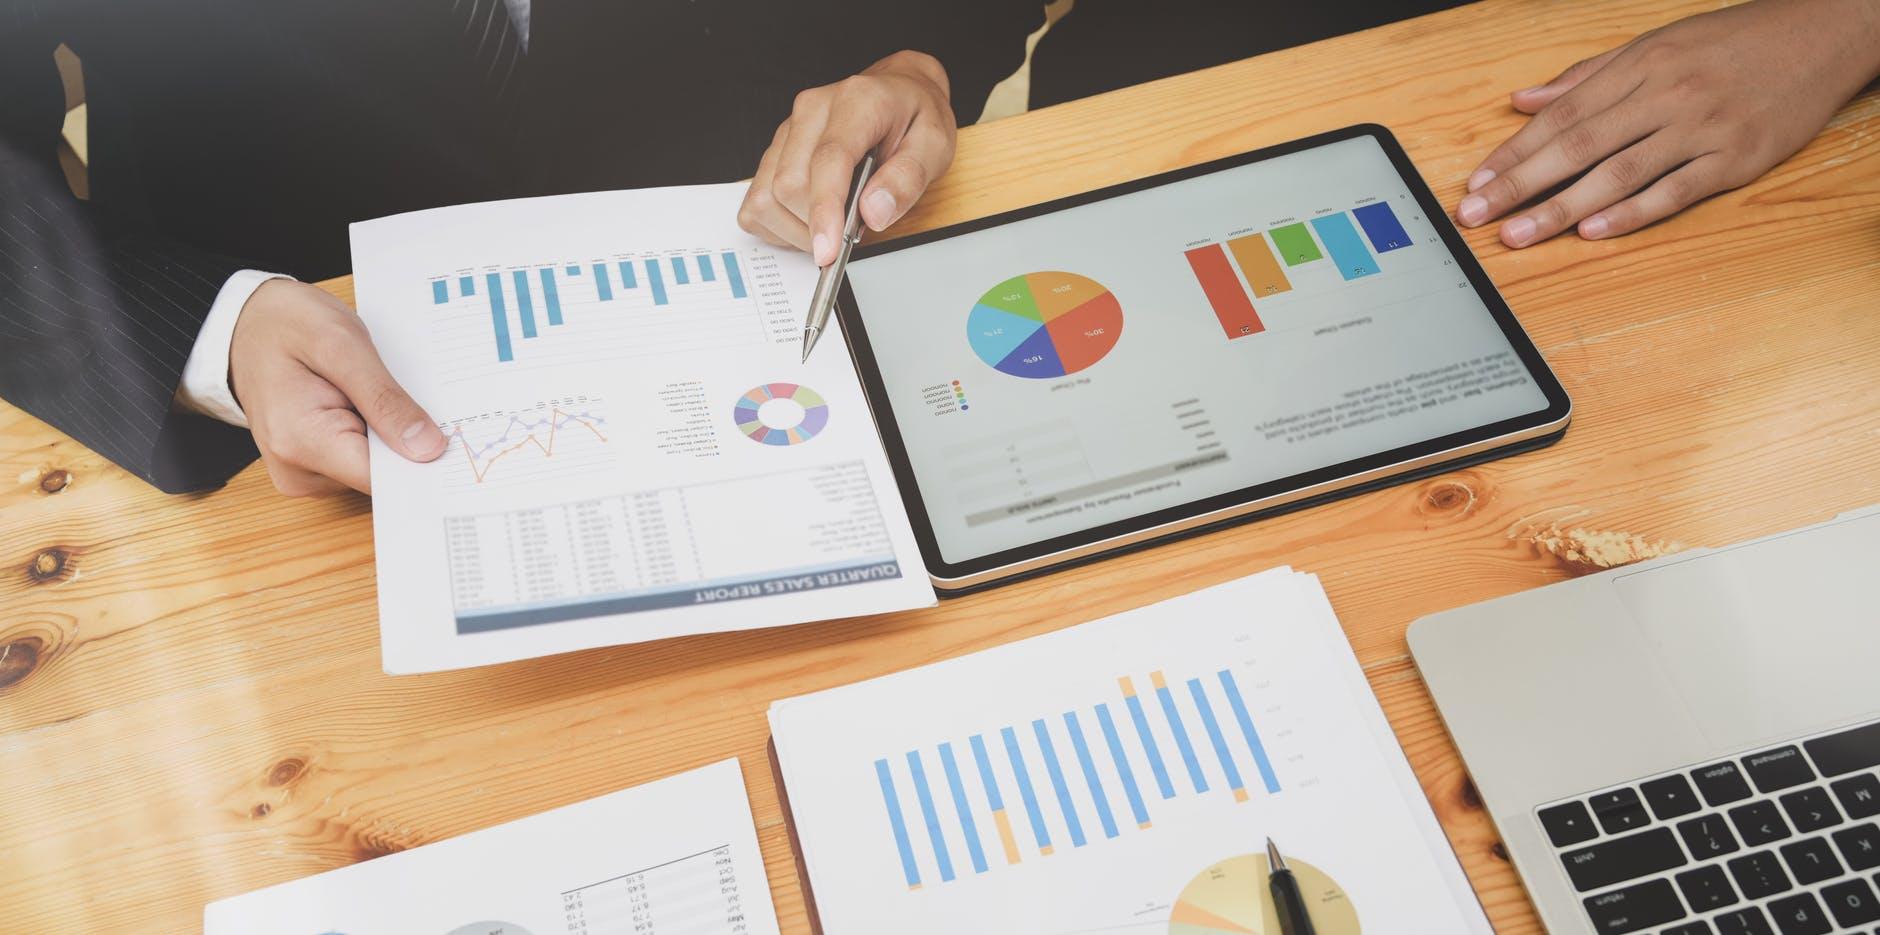 analysis-chart-graph-data-pexels-3740390